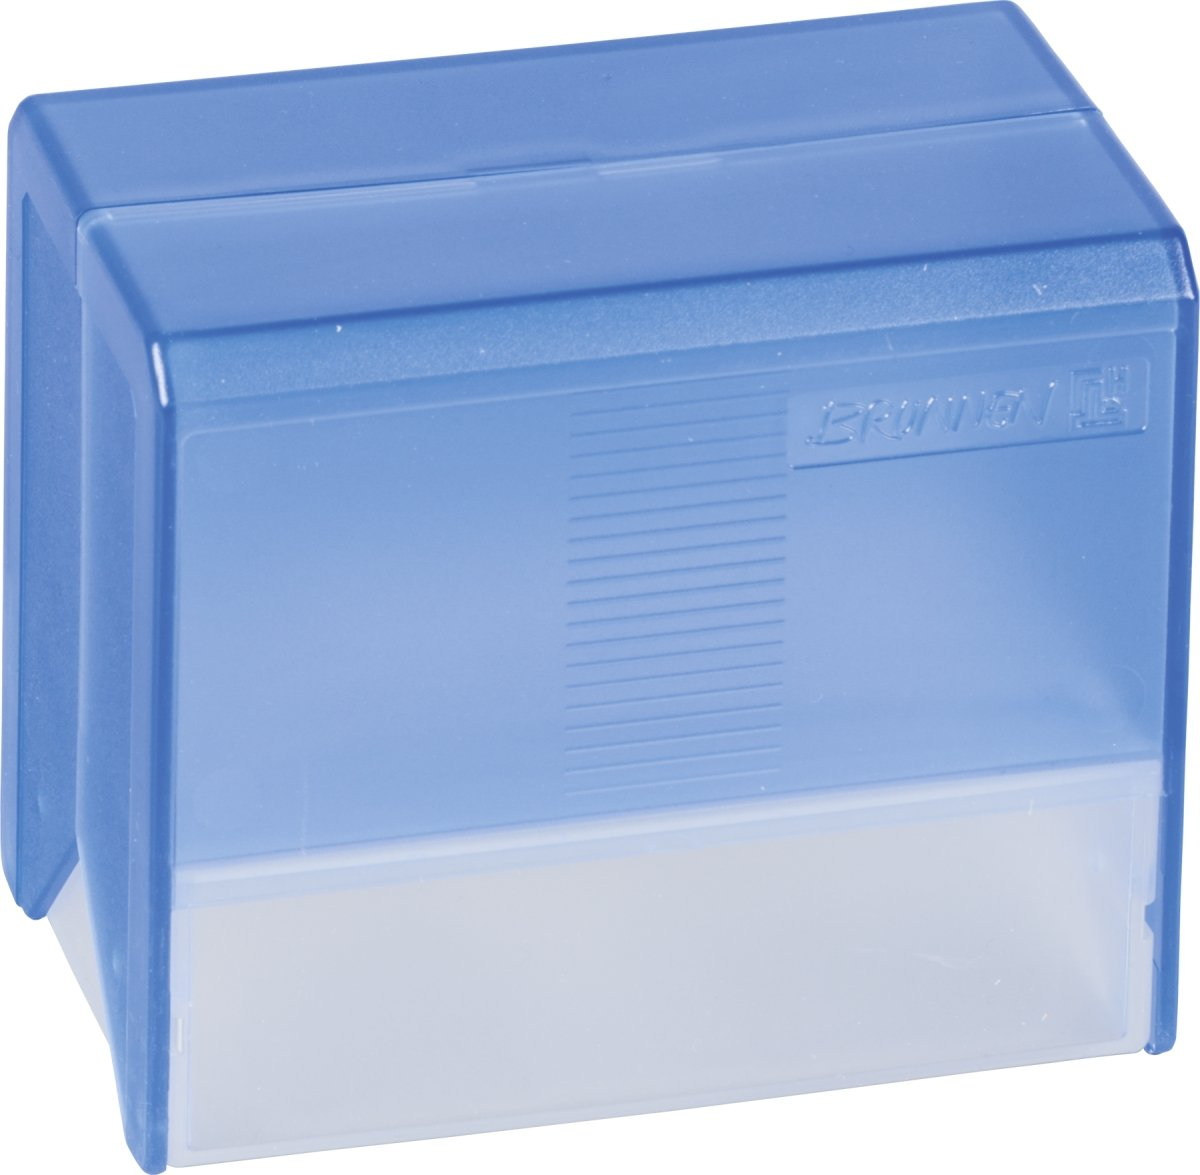 Brunnen Styrolux Index Card Box with approx. 250 Cards A7 Medium Blue brunnen компаньон мирадор